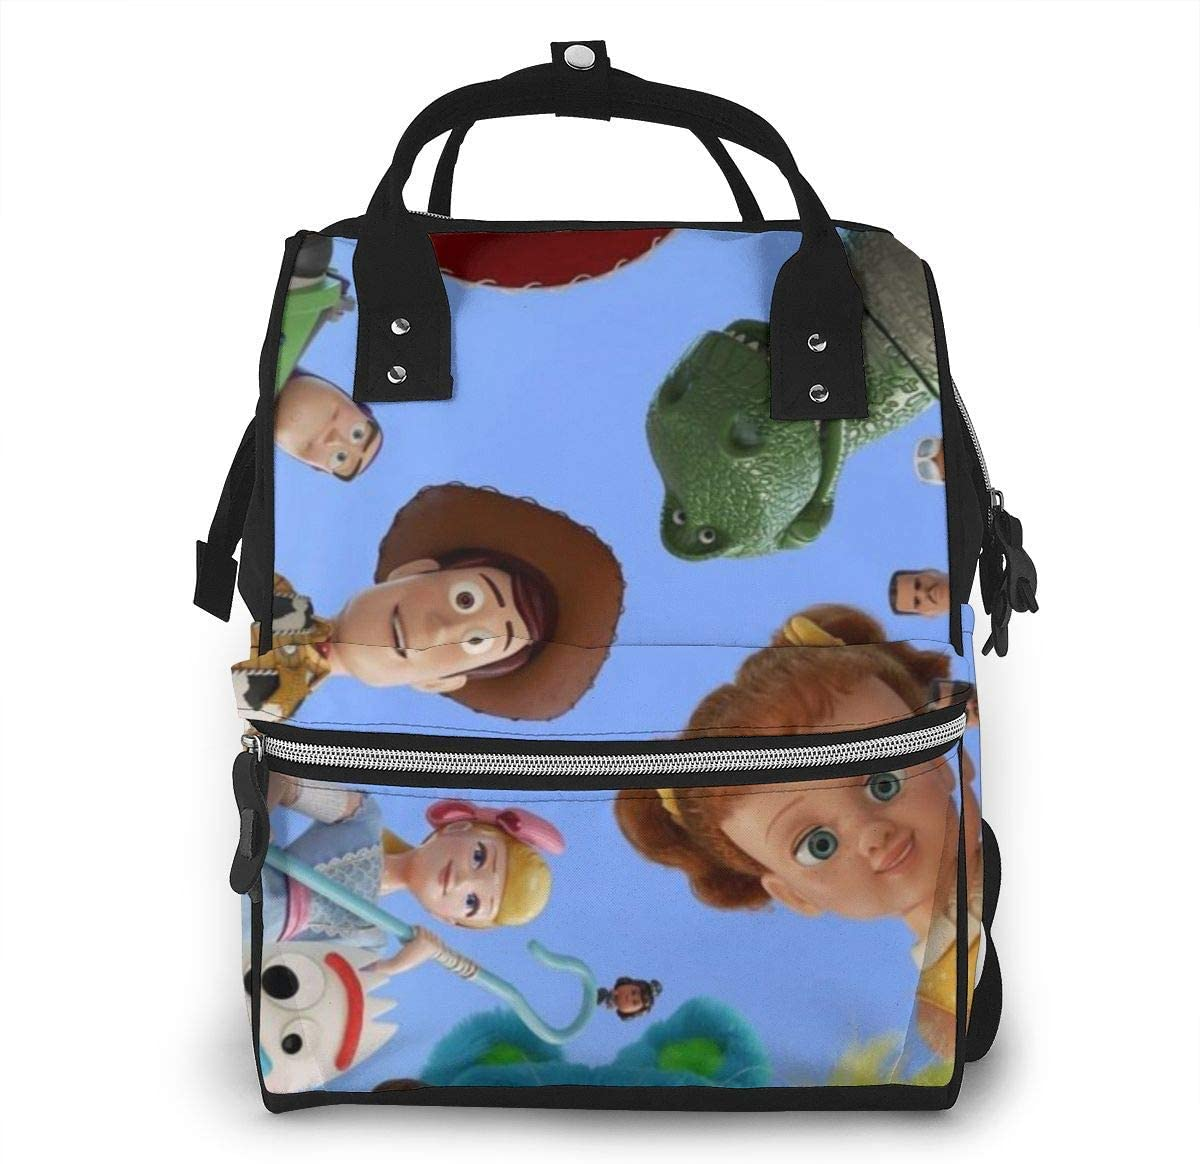 T-oy St-ory Family Multifunction Waterproof Travel Mochila Maternity Baby Nappy Changing Bags NHJYU Bolsa de pa/ñales Mochila